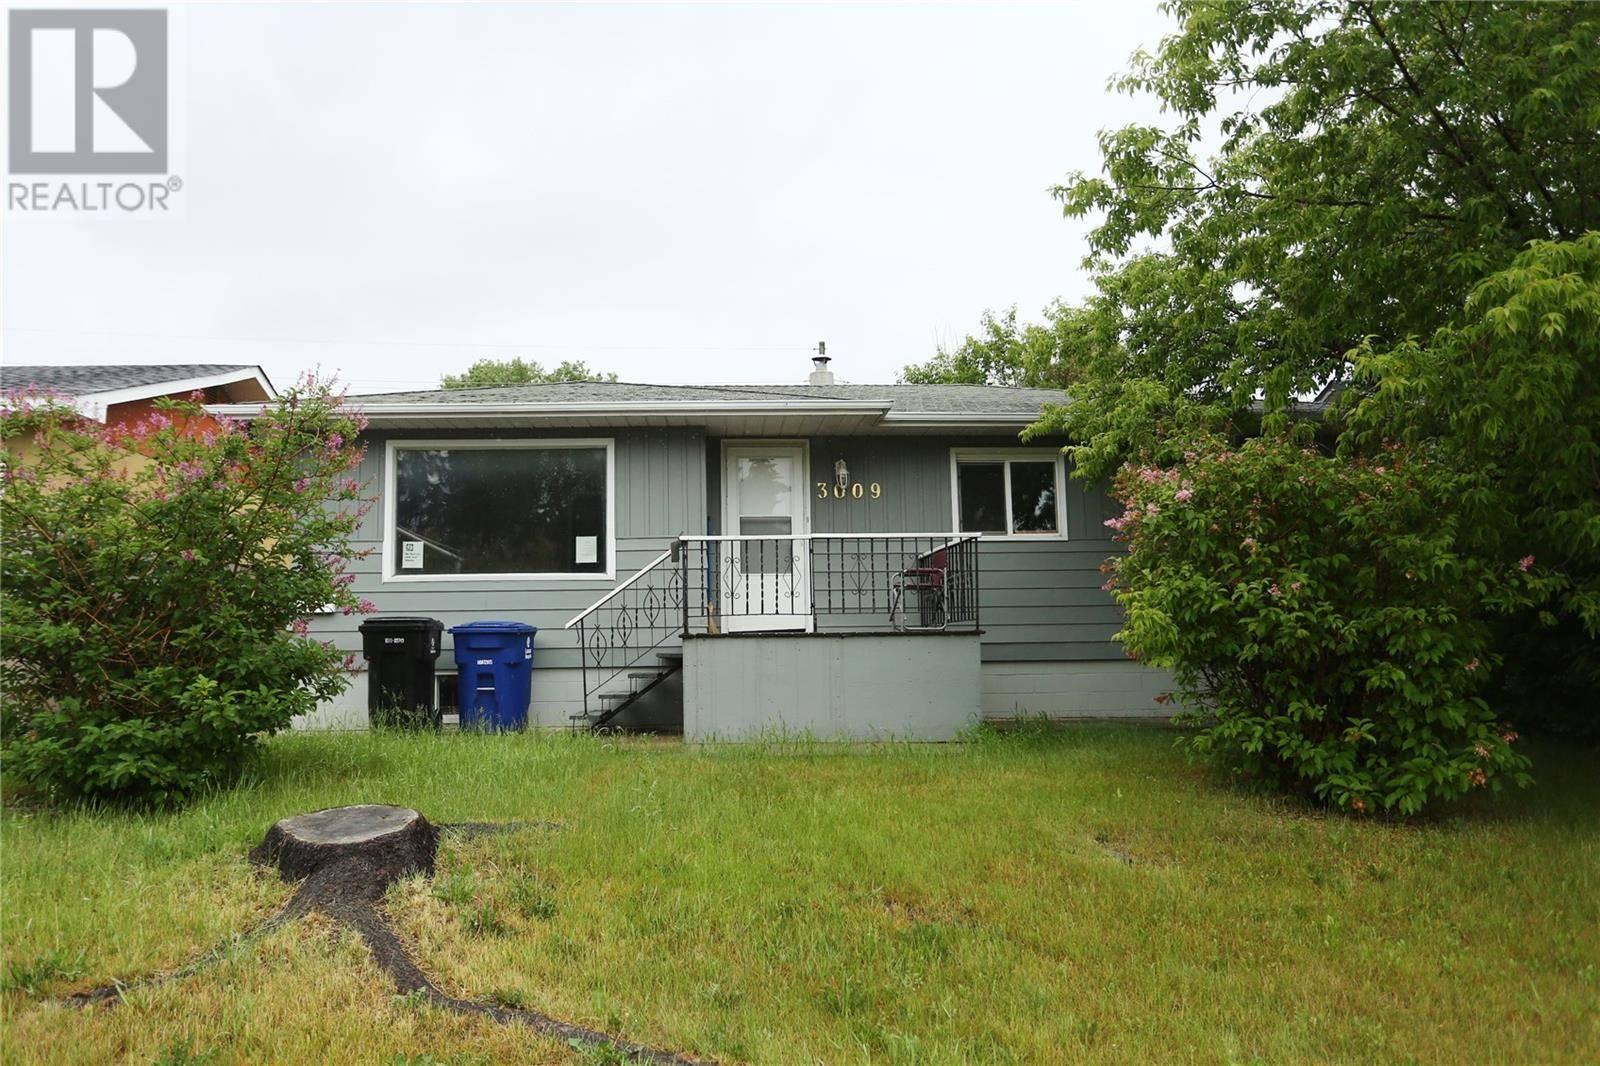 House for sale at 3009 20th St W Saskatoon Saskatchewan - MLS: SK783470